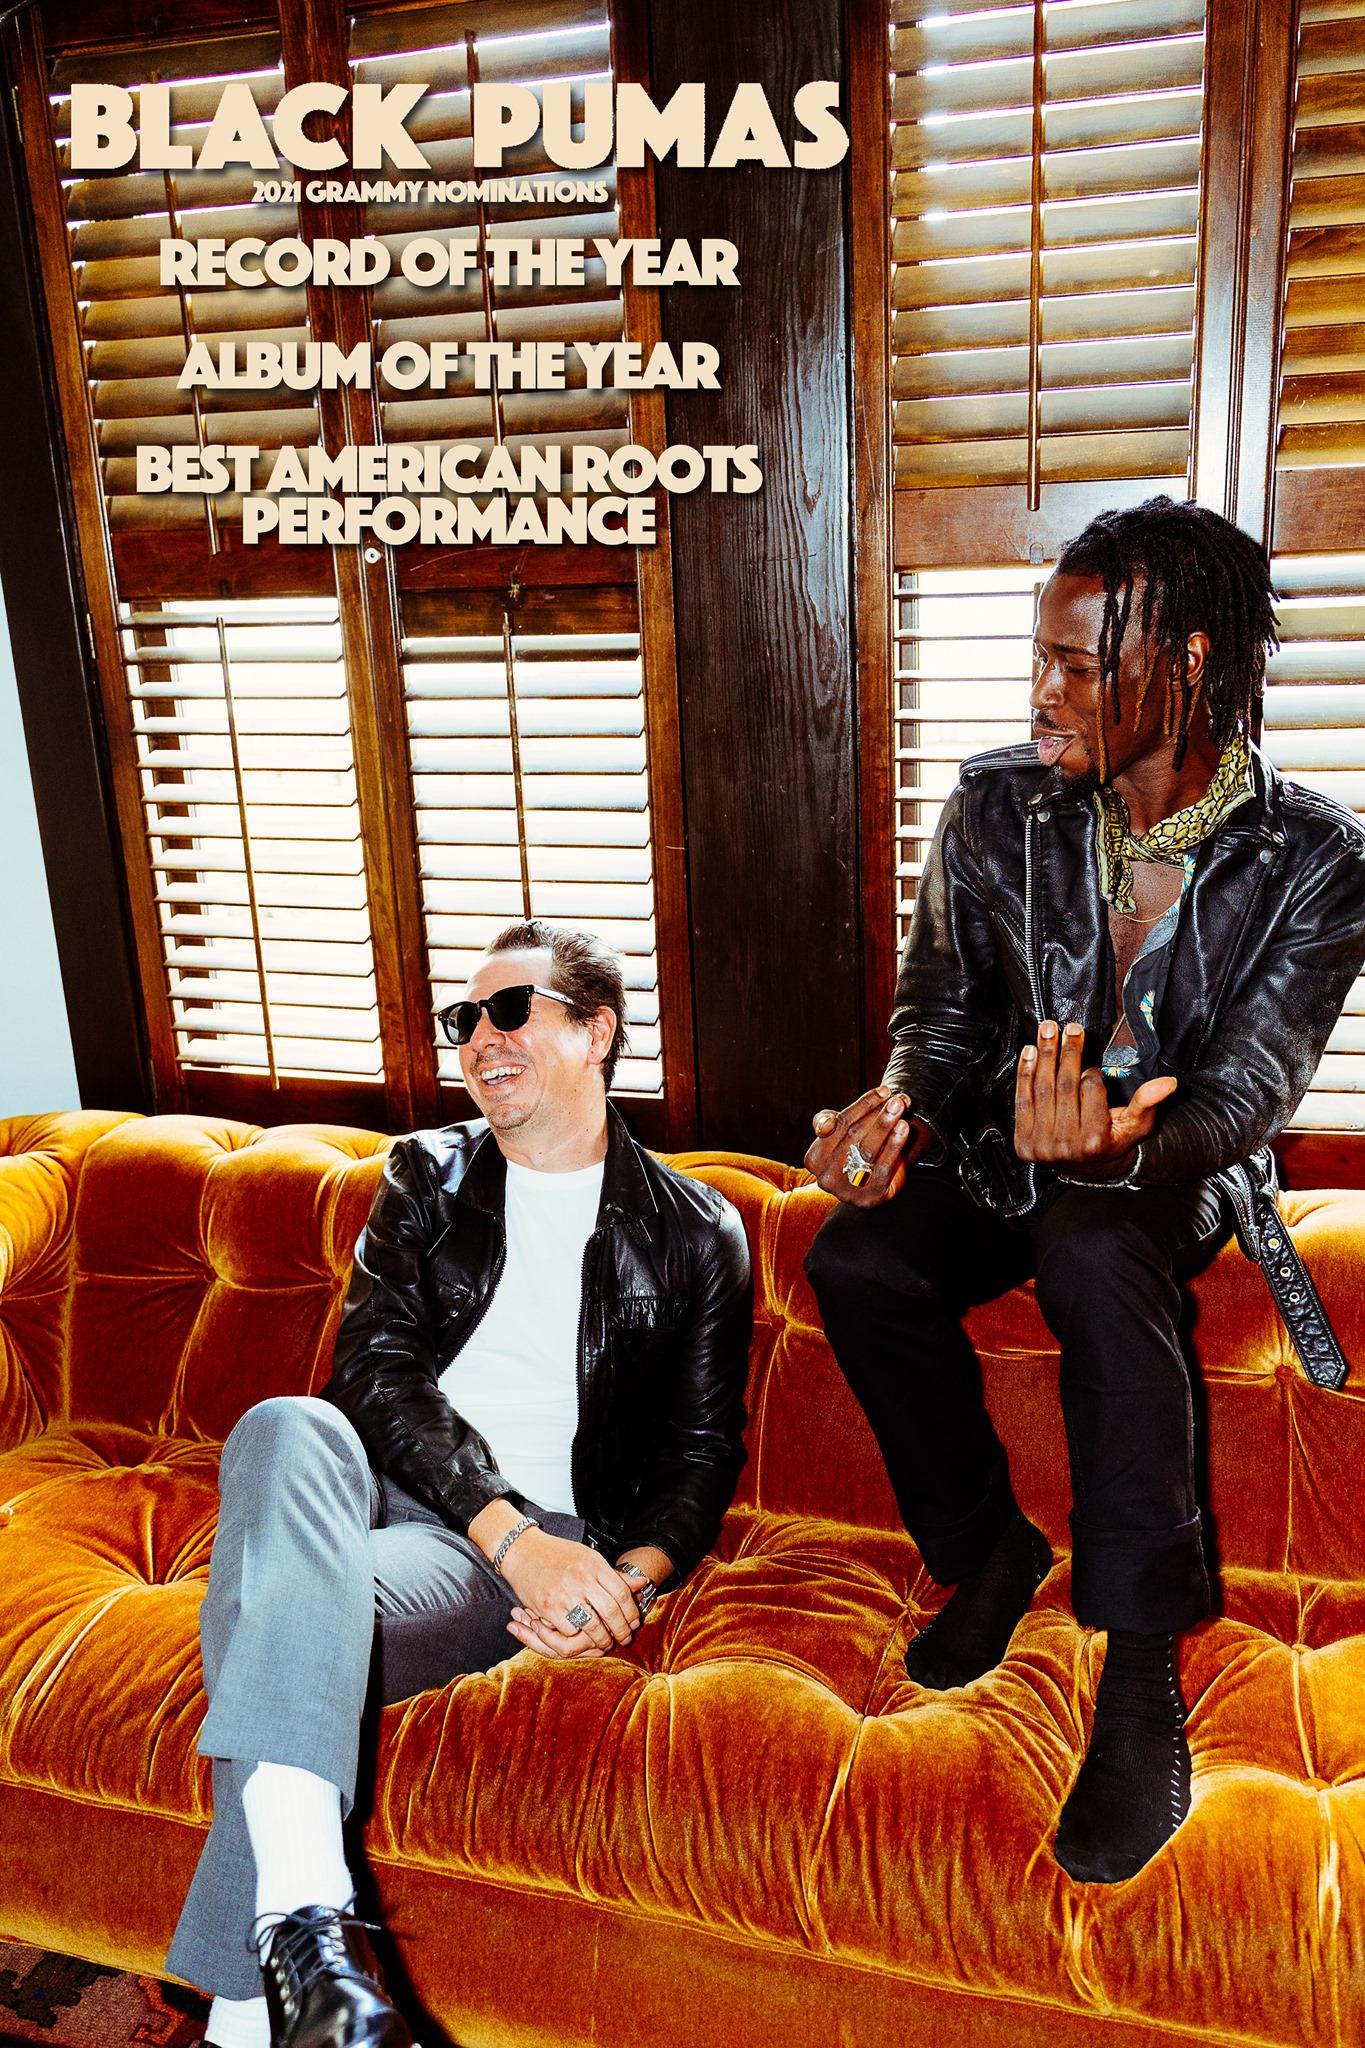 Black Pumas, 2021 Grammy nominees!